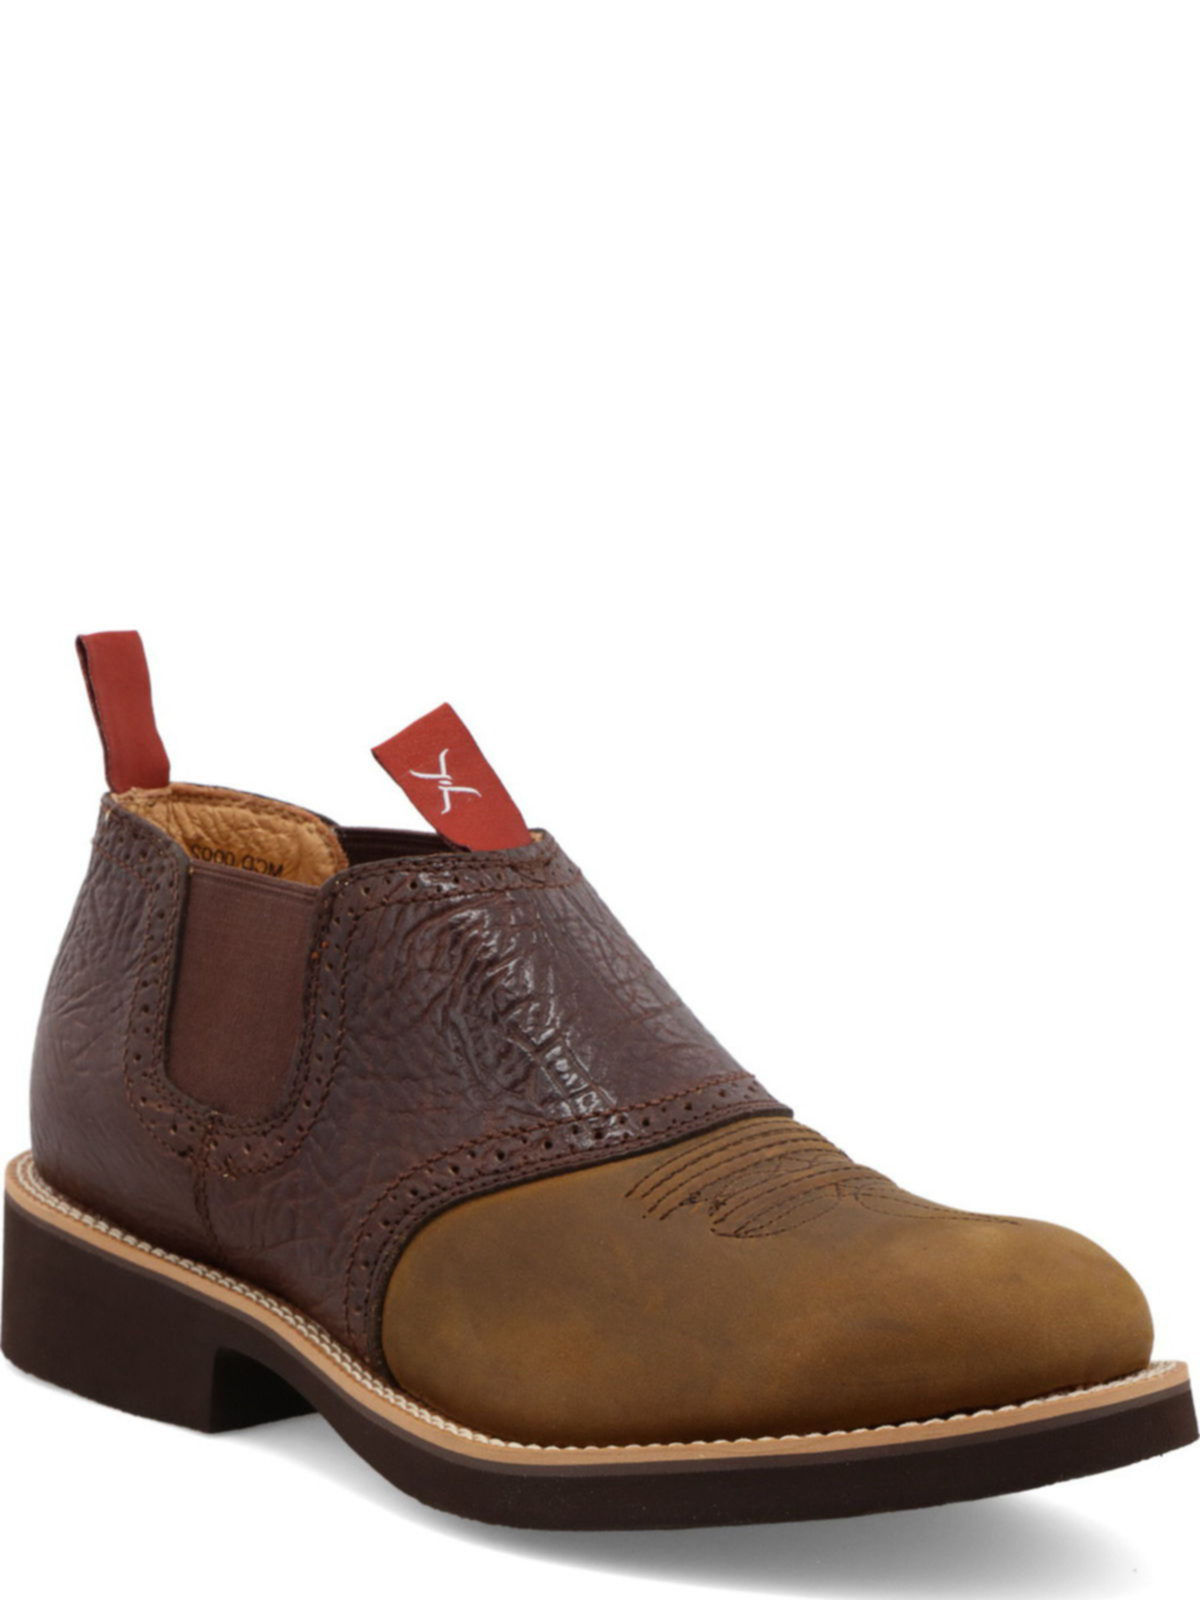 BootAmerica  Twisted X Mens Cowdog Shoe Distressed Saddle